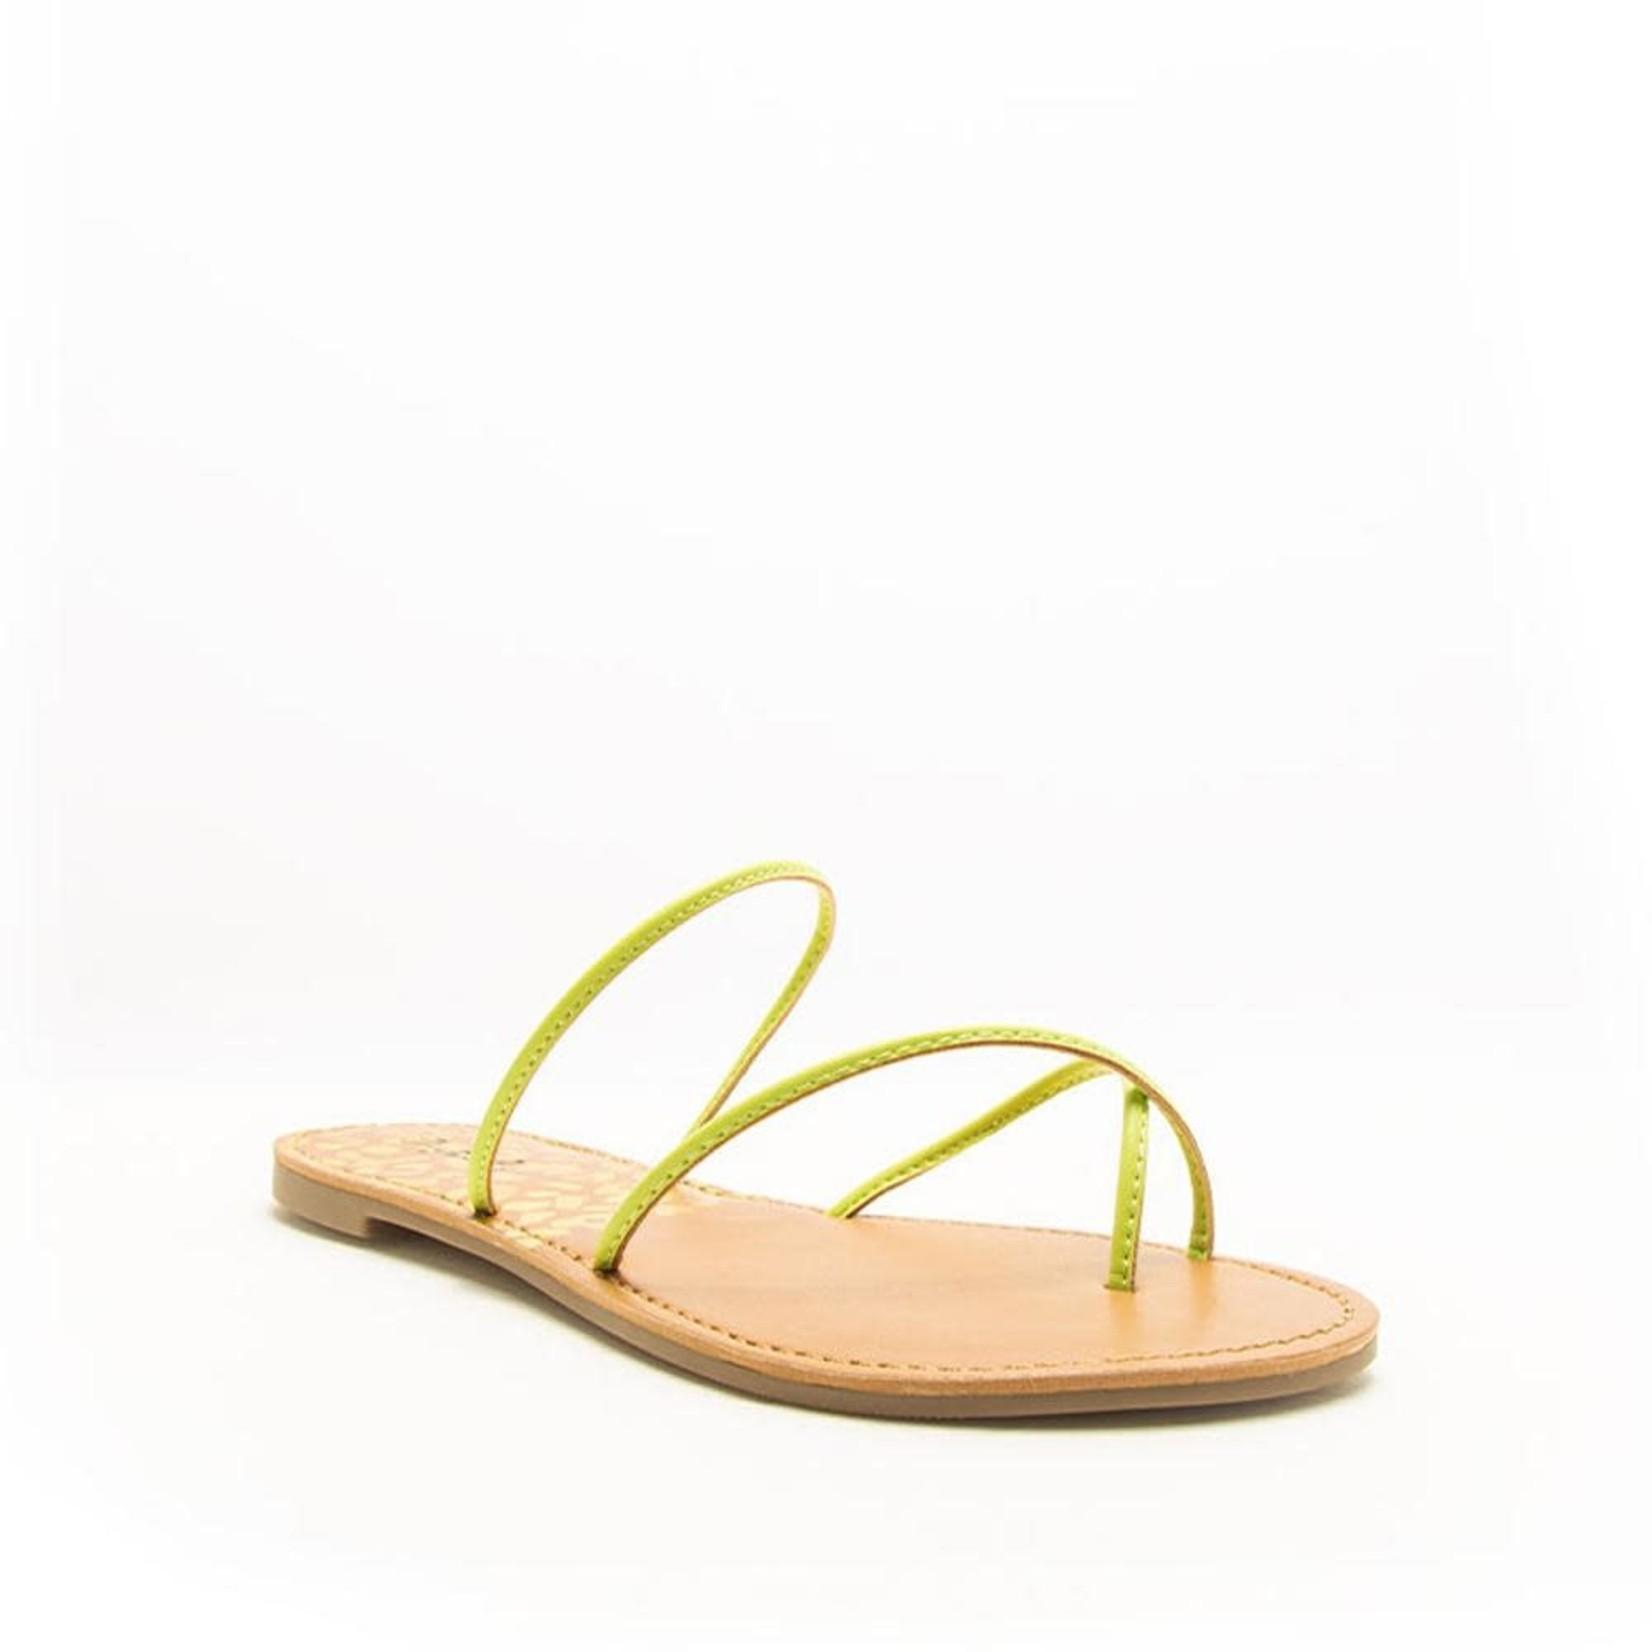 Neon Yellow Sandal